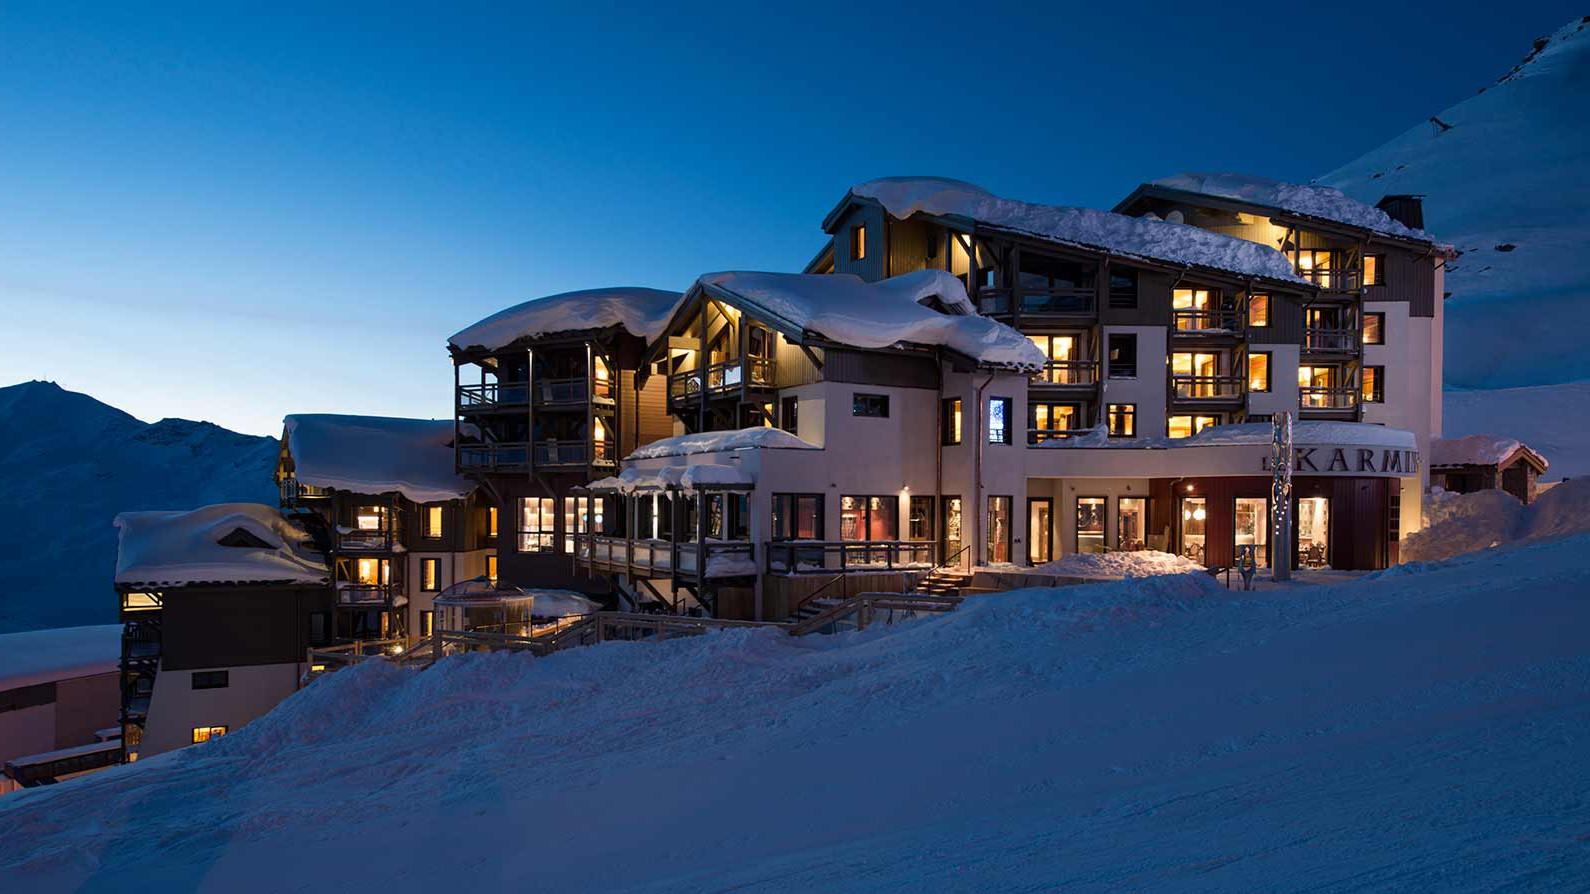 Hotel Le Hameau du Kashmir, Val Thorens -  Exterior night